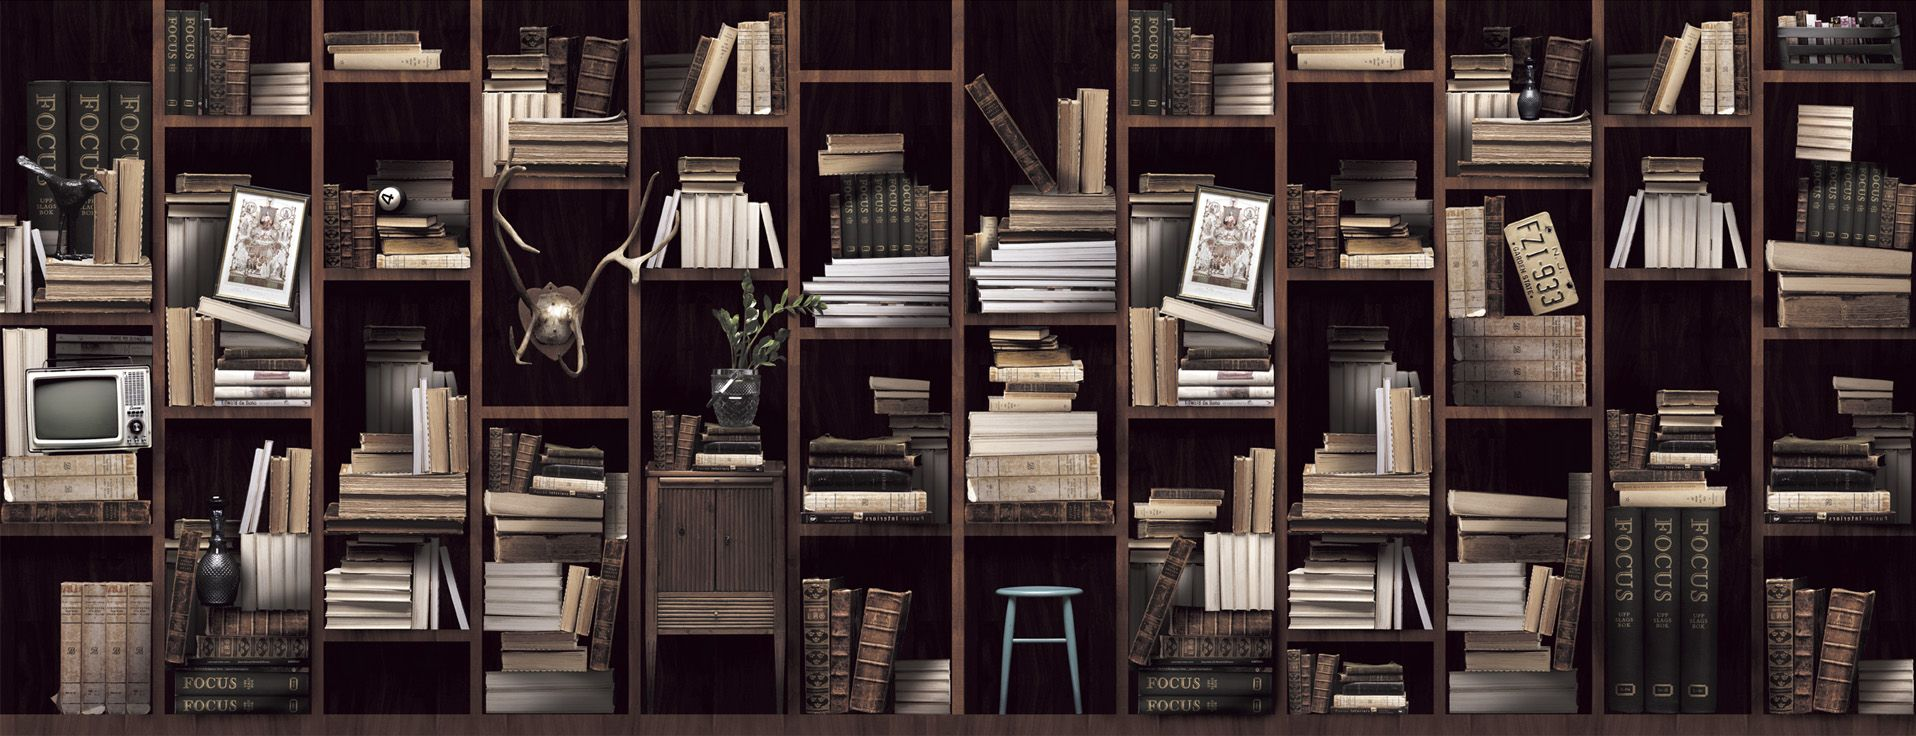 Wallpapers Bookshelf 1920x1200 26